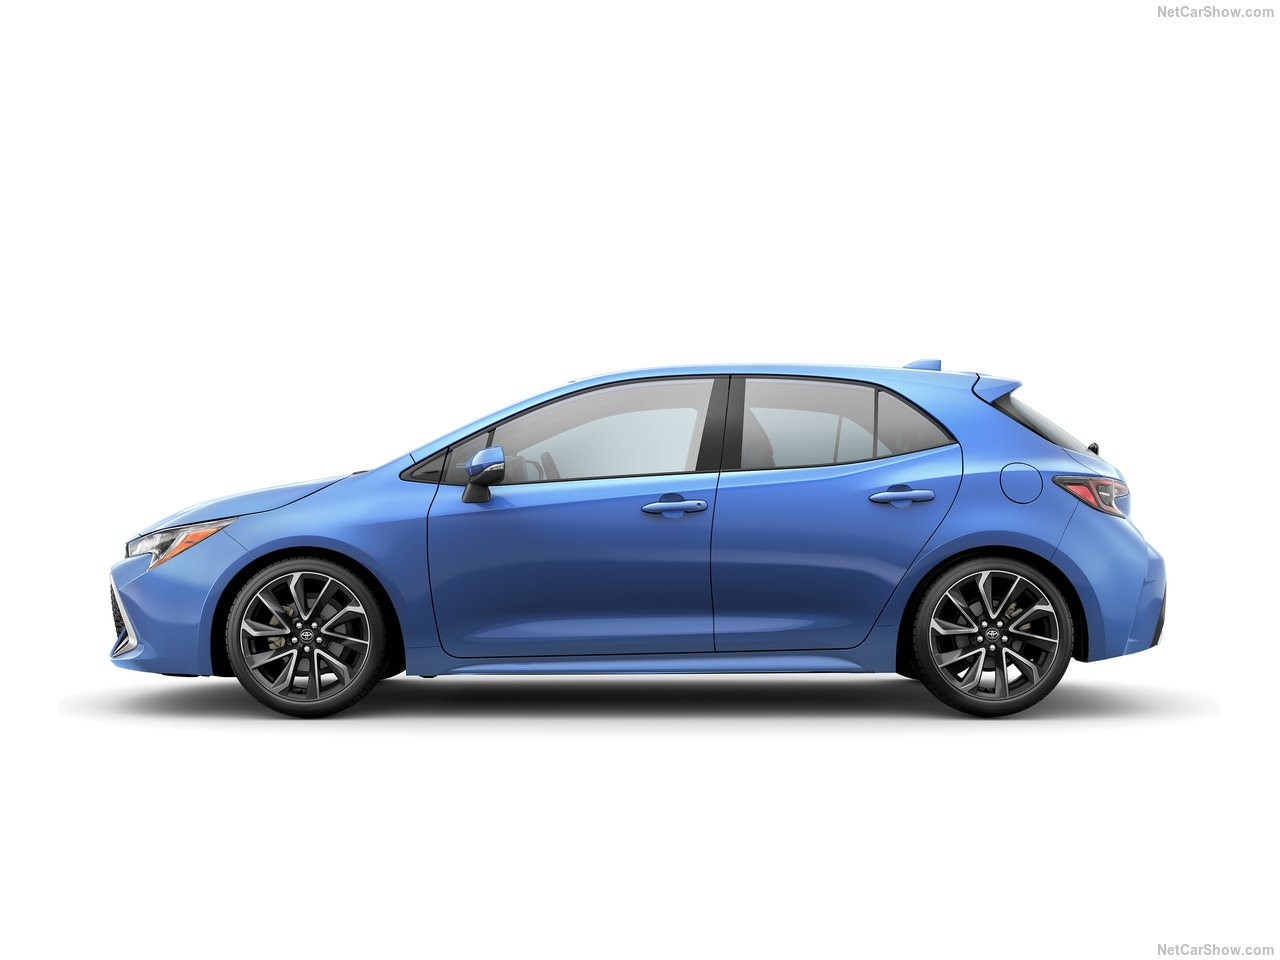 Toyota-Corolla_Hatchback-2019-1280-05.jpg